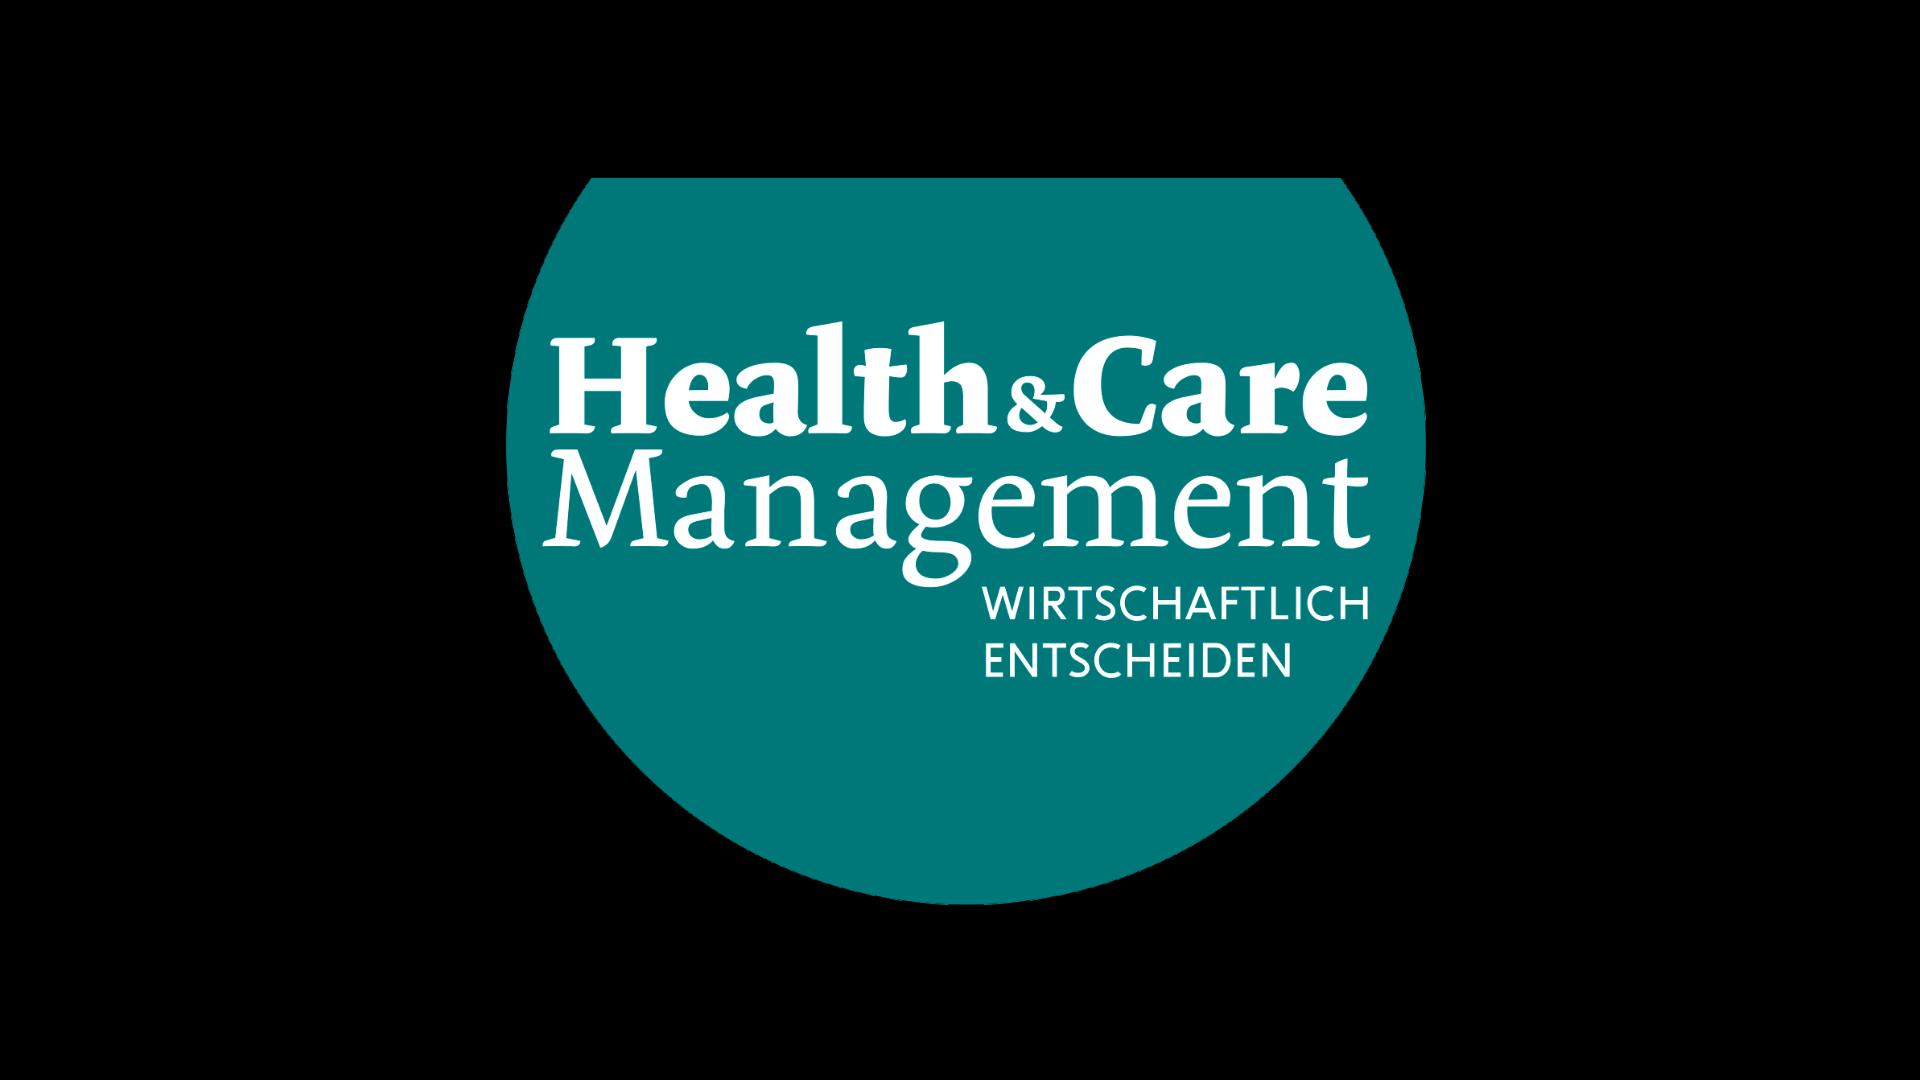 Health Care Management Academy Krisenkommunikation Messenger Marketing